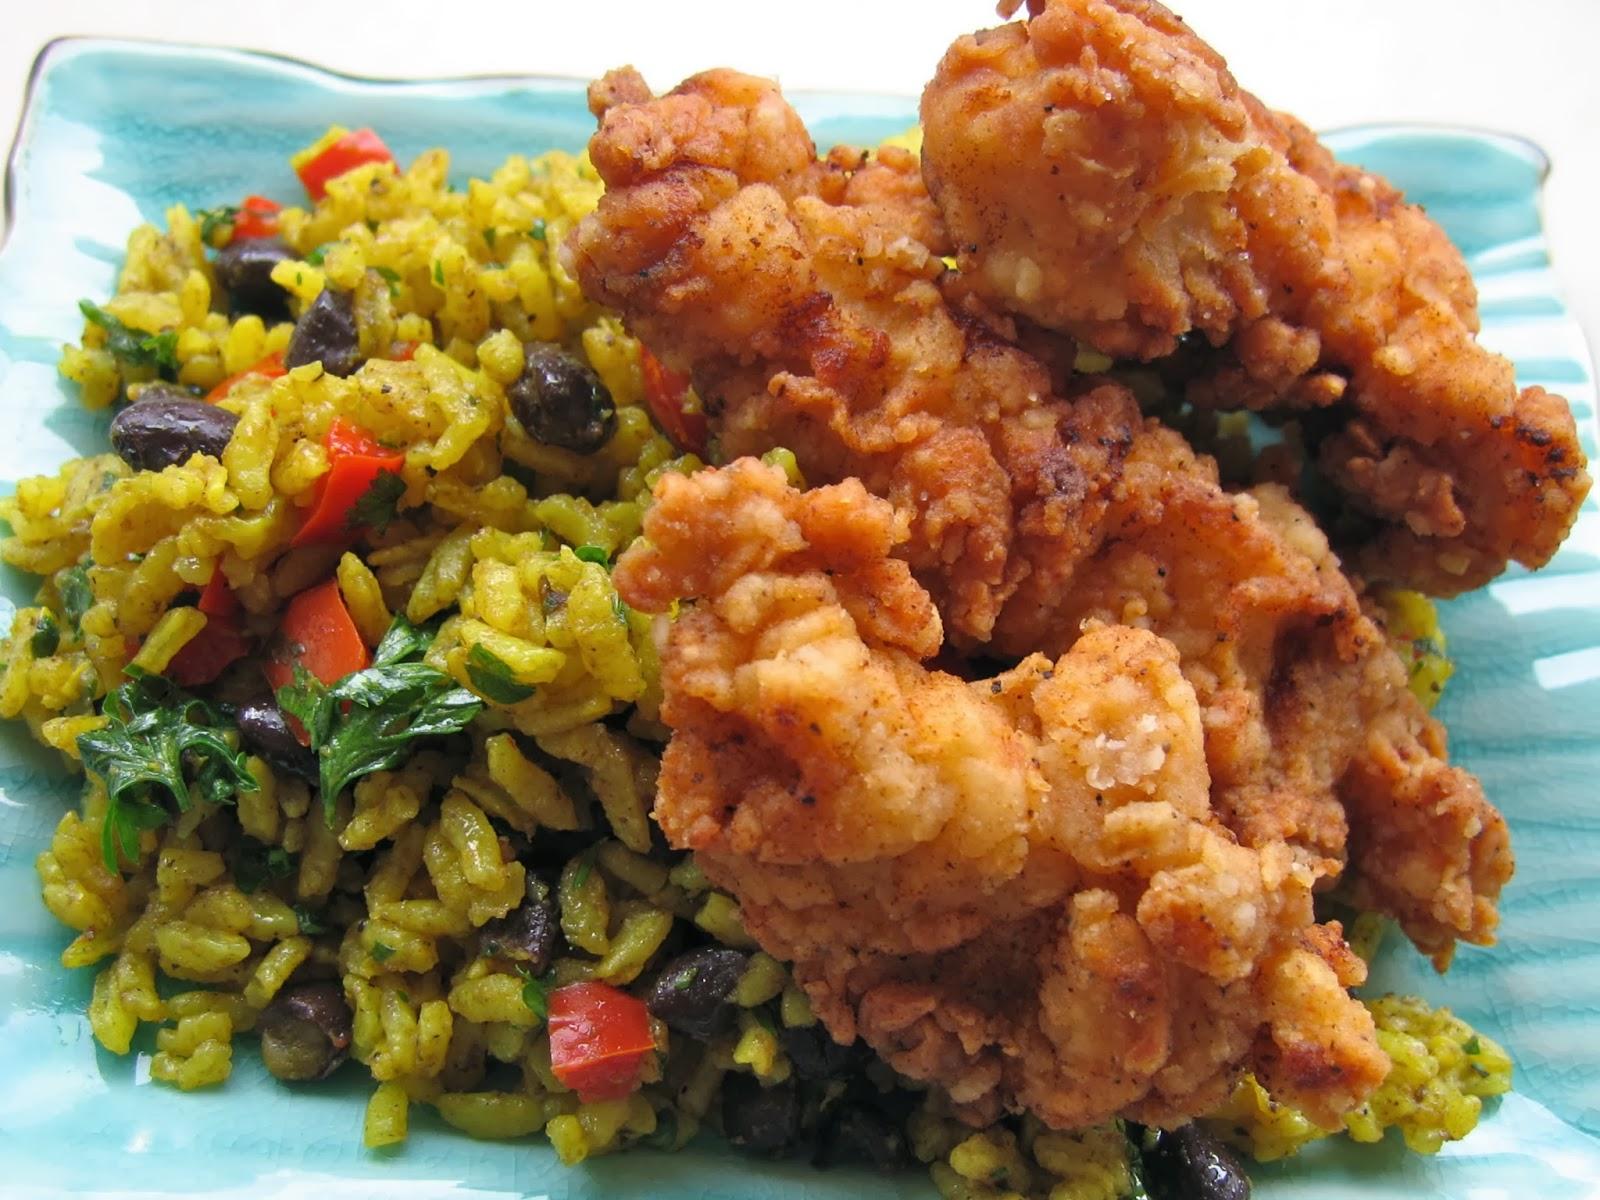 Yobodish Korean Recipes: Fried Chicken with Yellow Rice